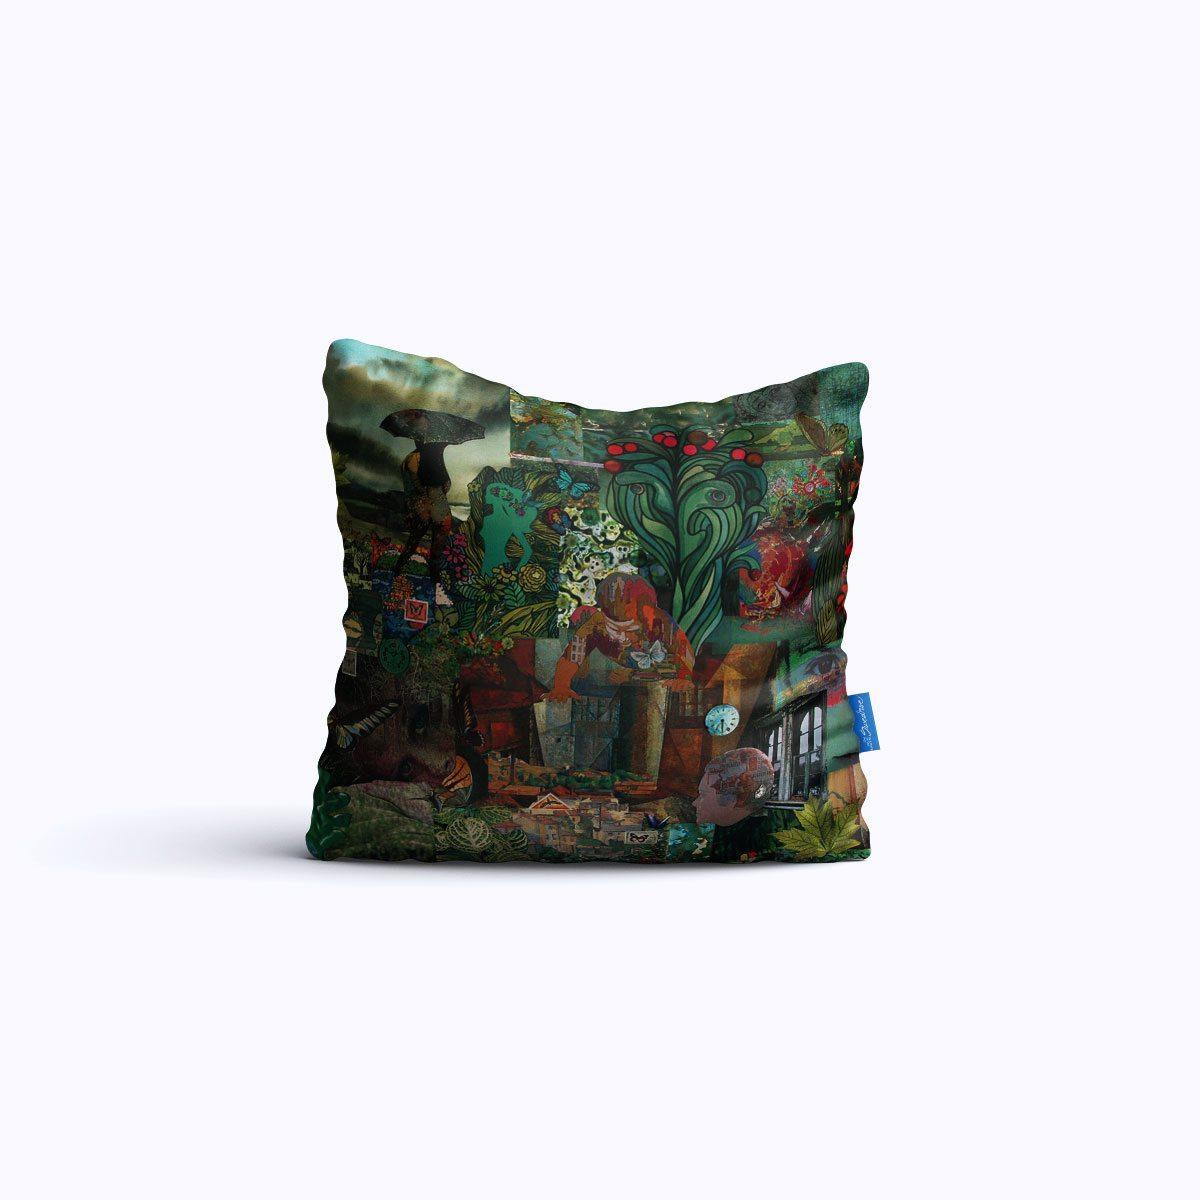 RMS001-Rainy Reprise – Throw Pillow – Swedroe Licensing-RepriseWEB-pillow01